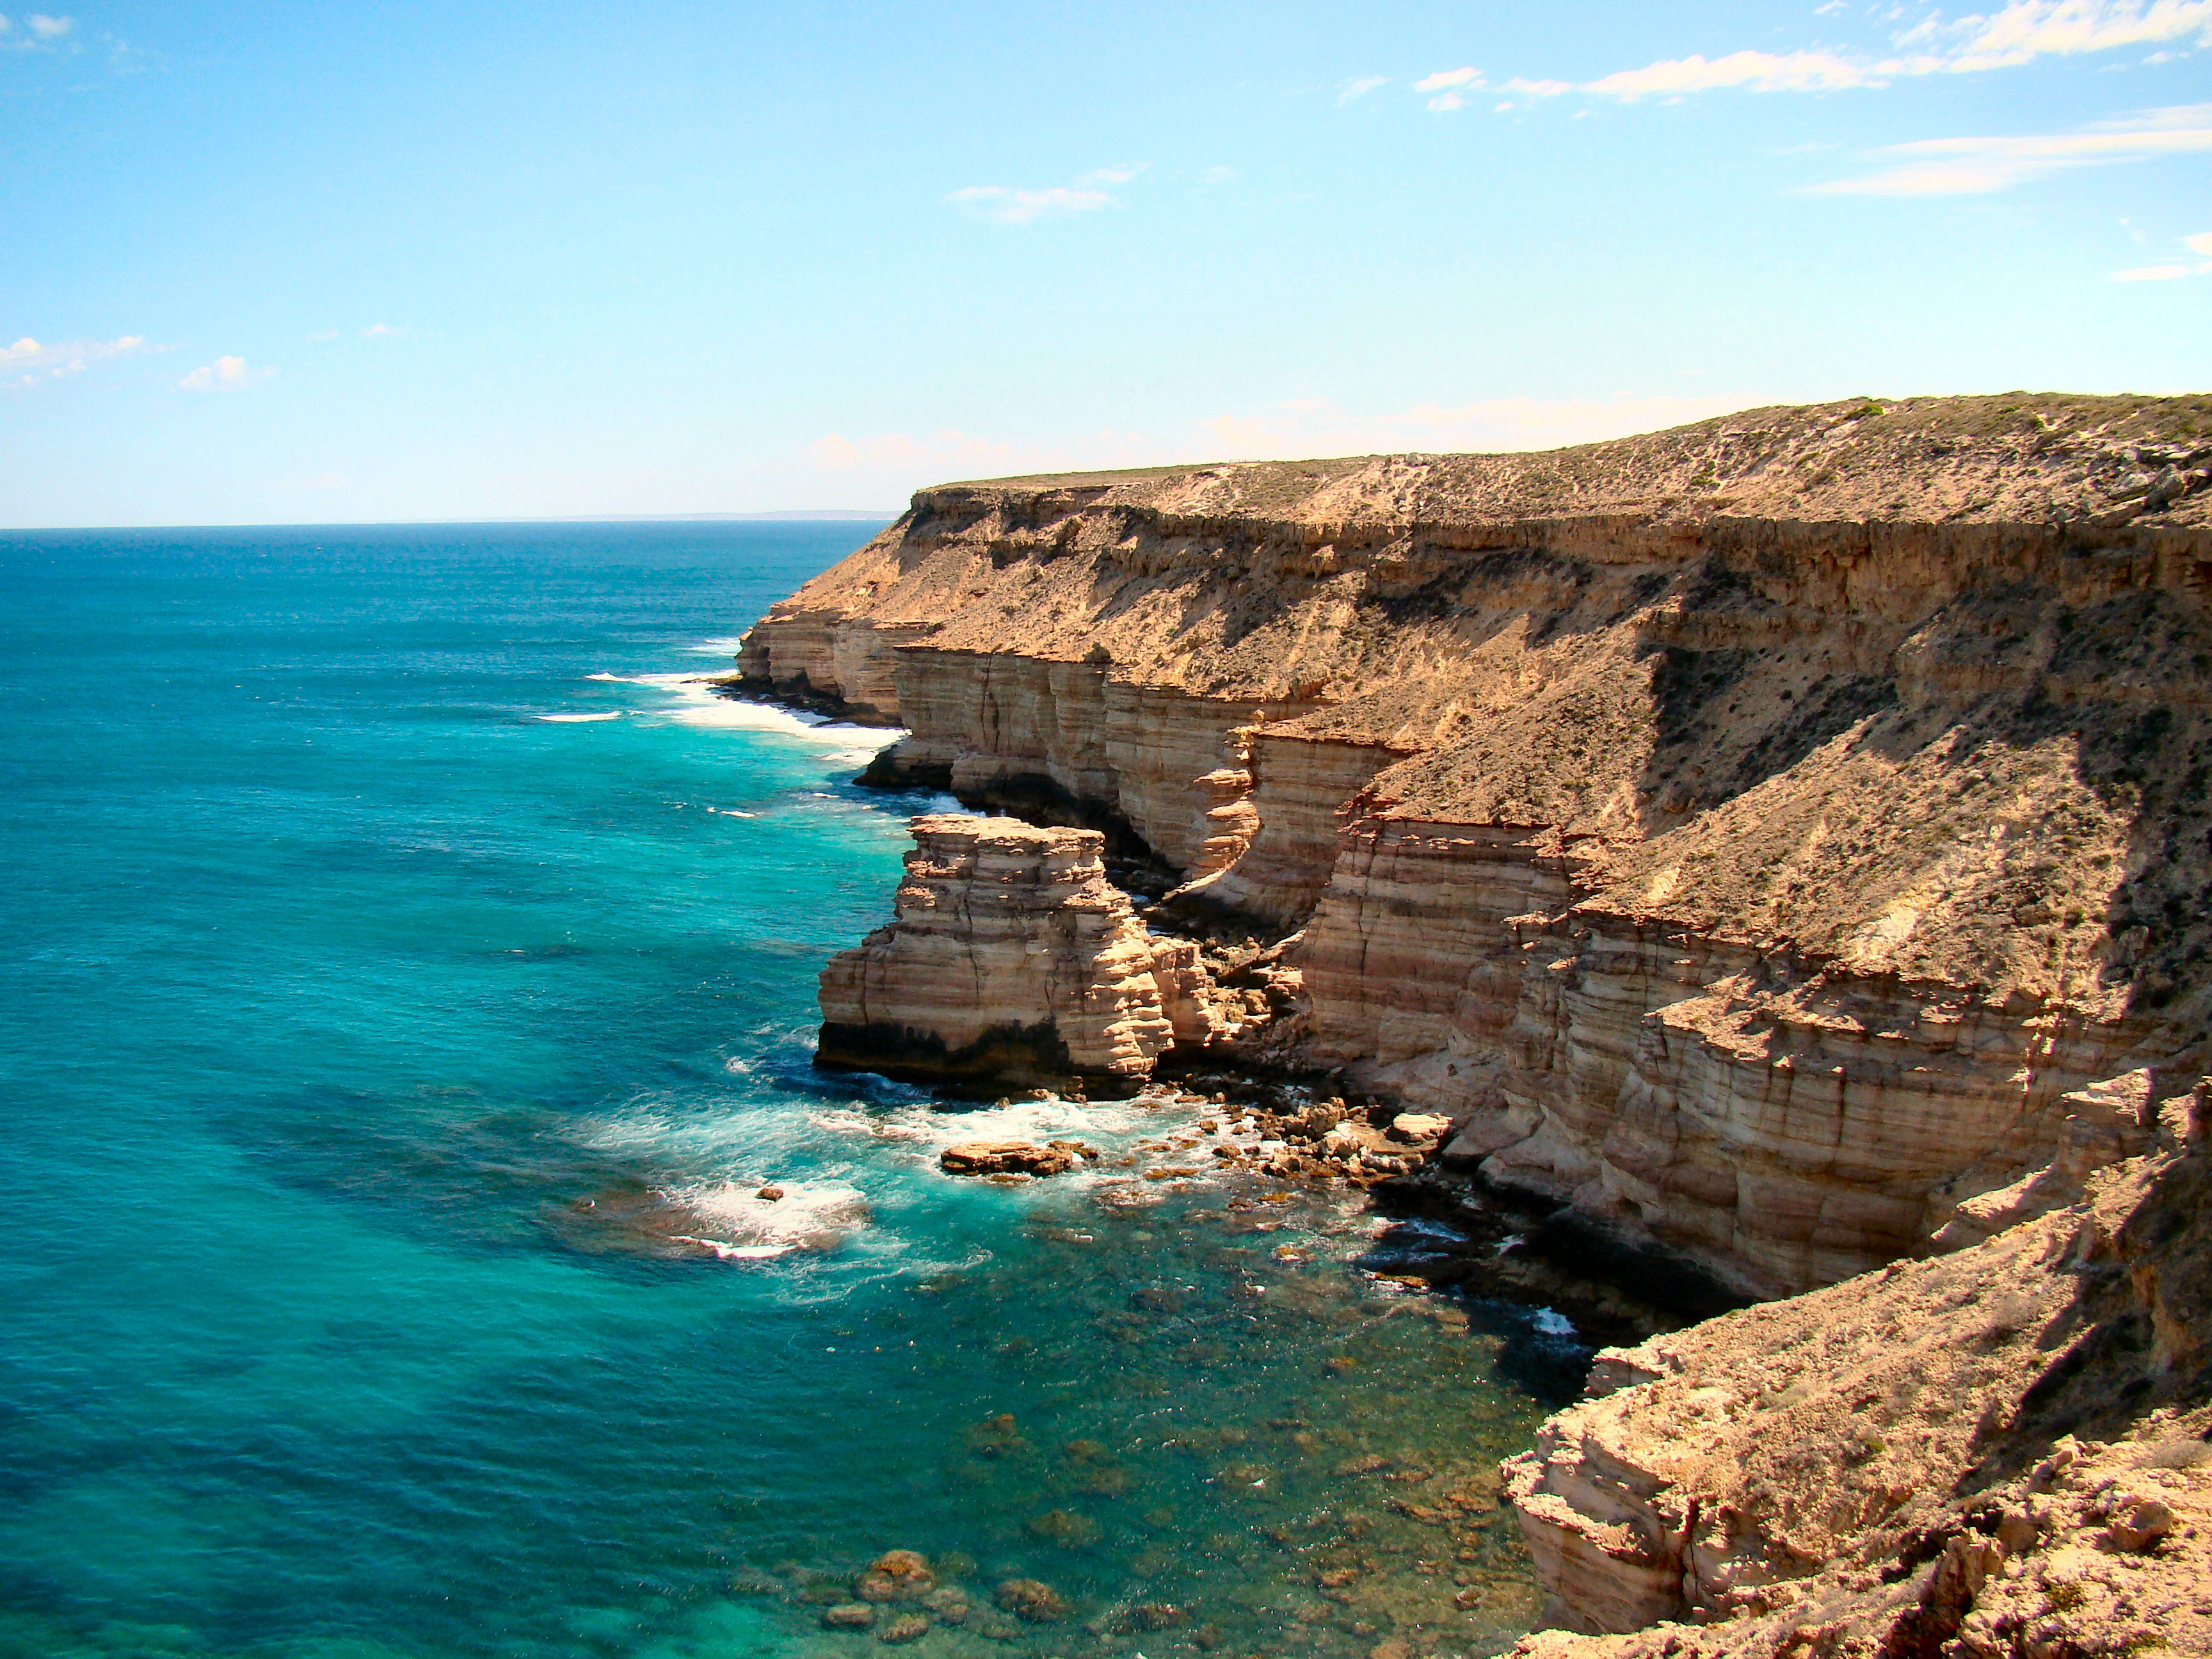 Kalbarri-Town-fly-in-ufc-wa-flying-club-cliffs